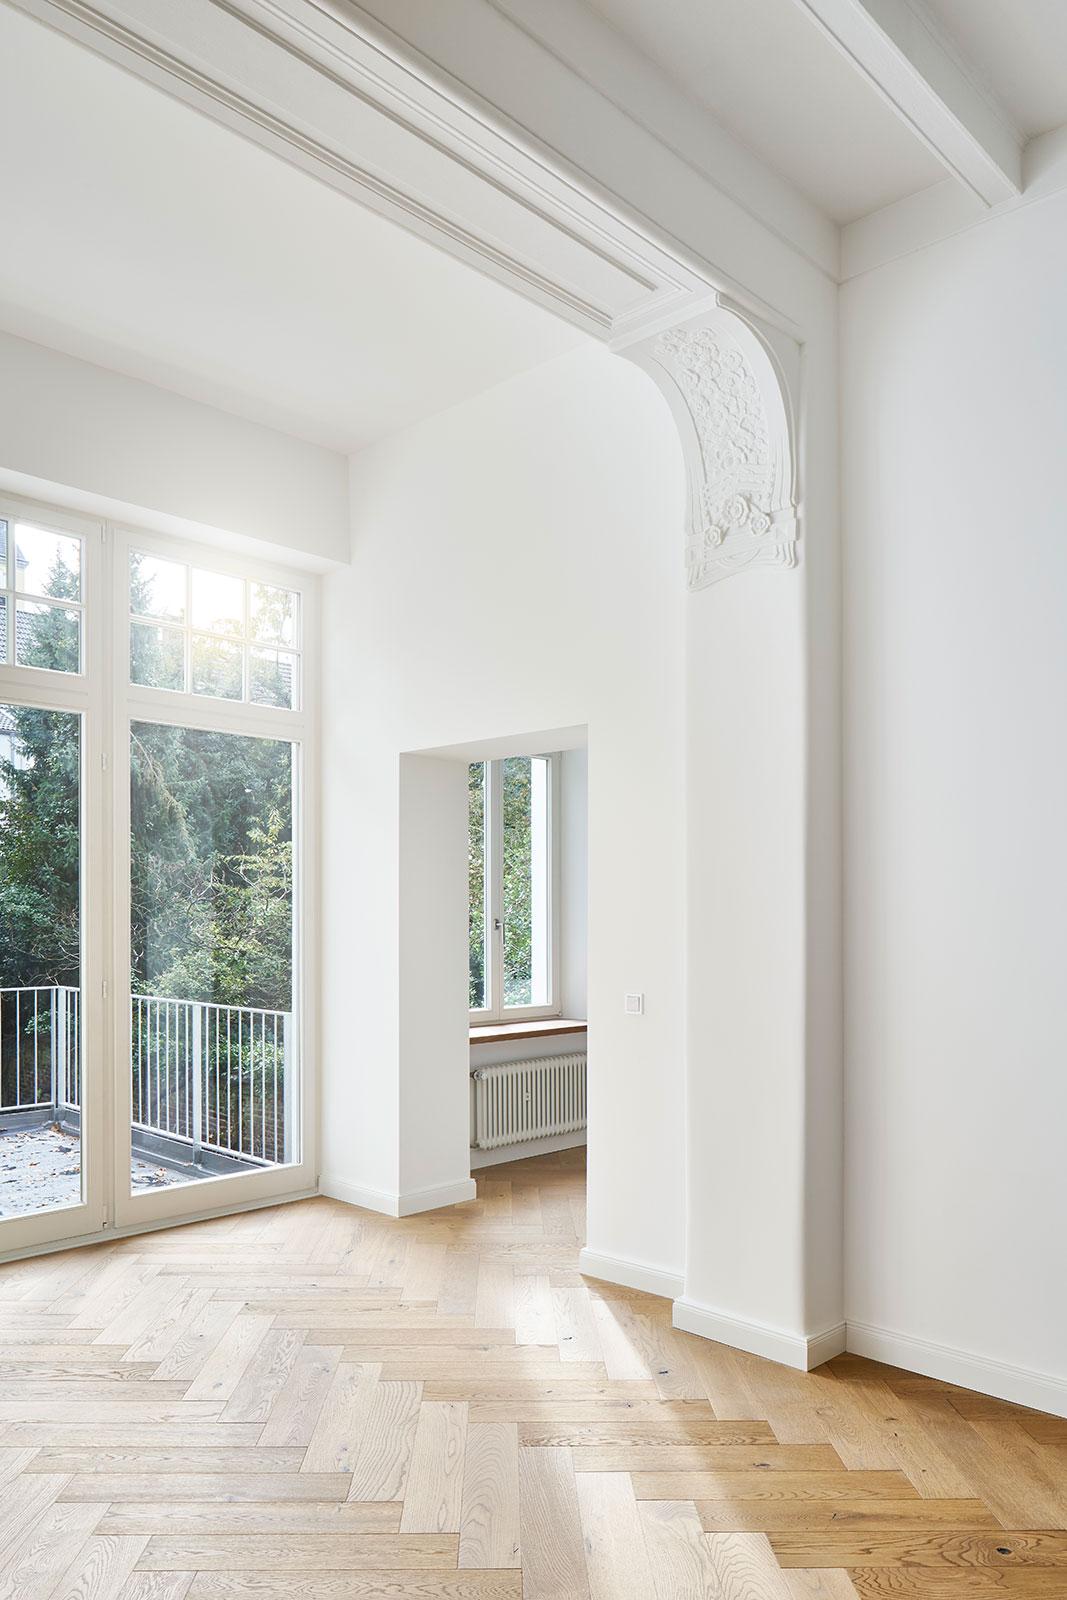 Haus J in Grafenberg, Düsseldorf  Foto: Annika Feuss